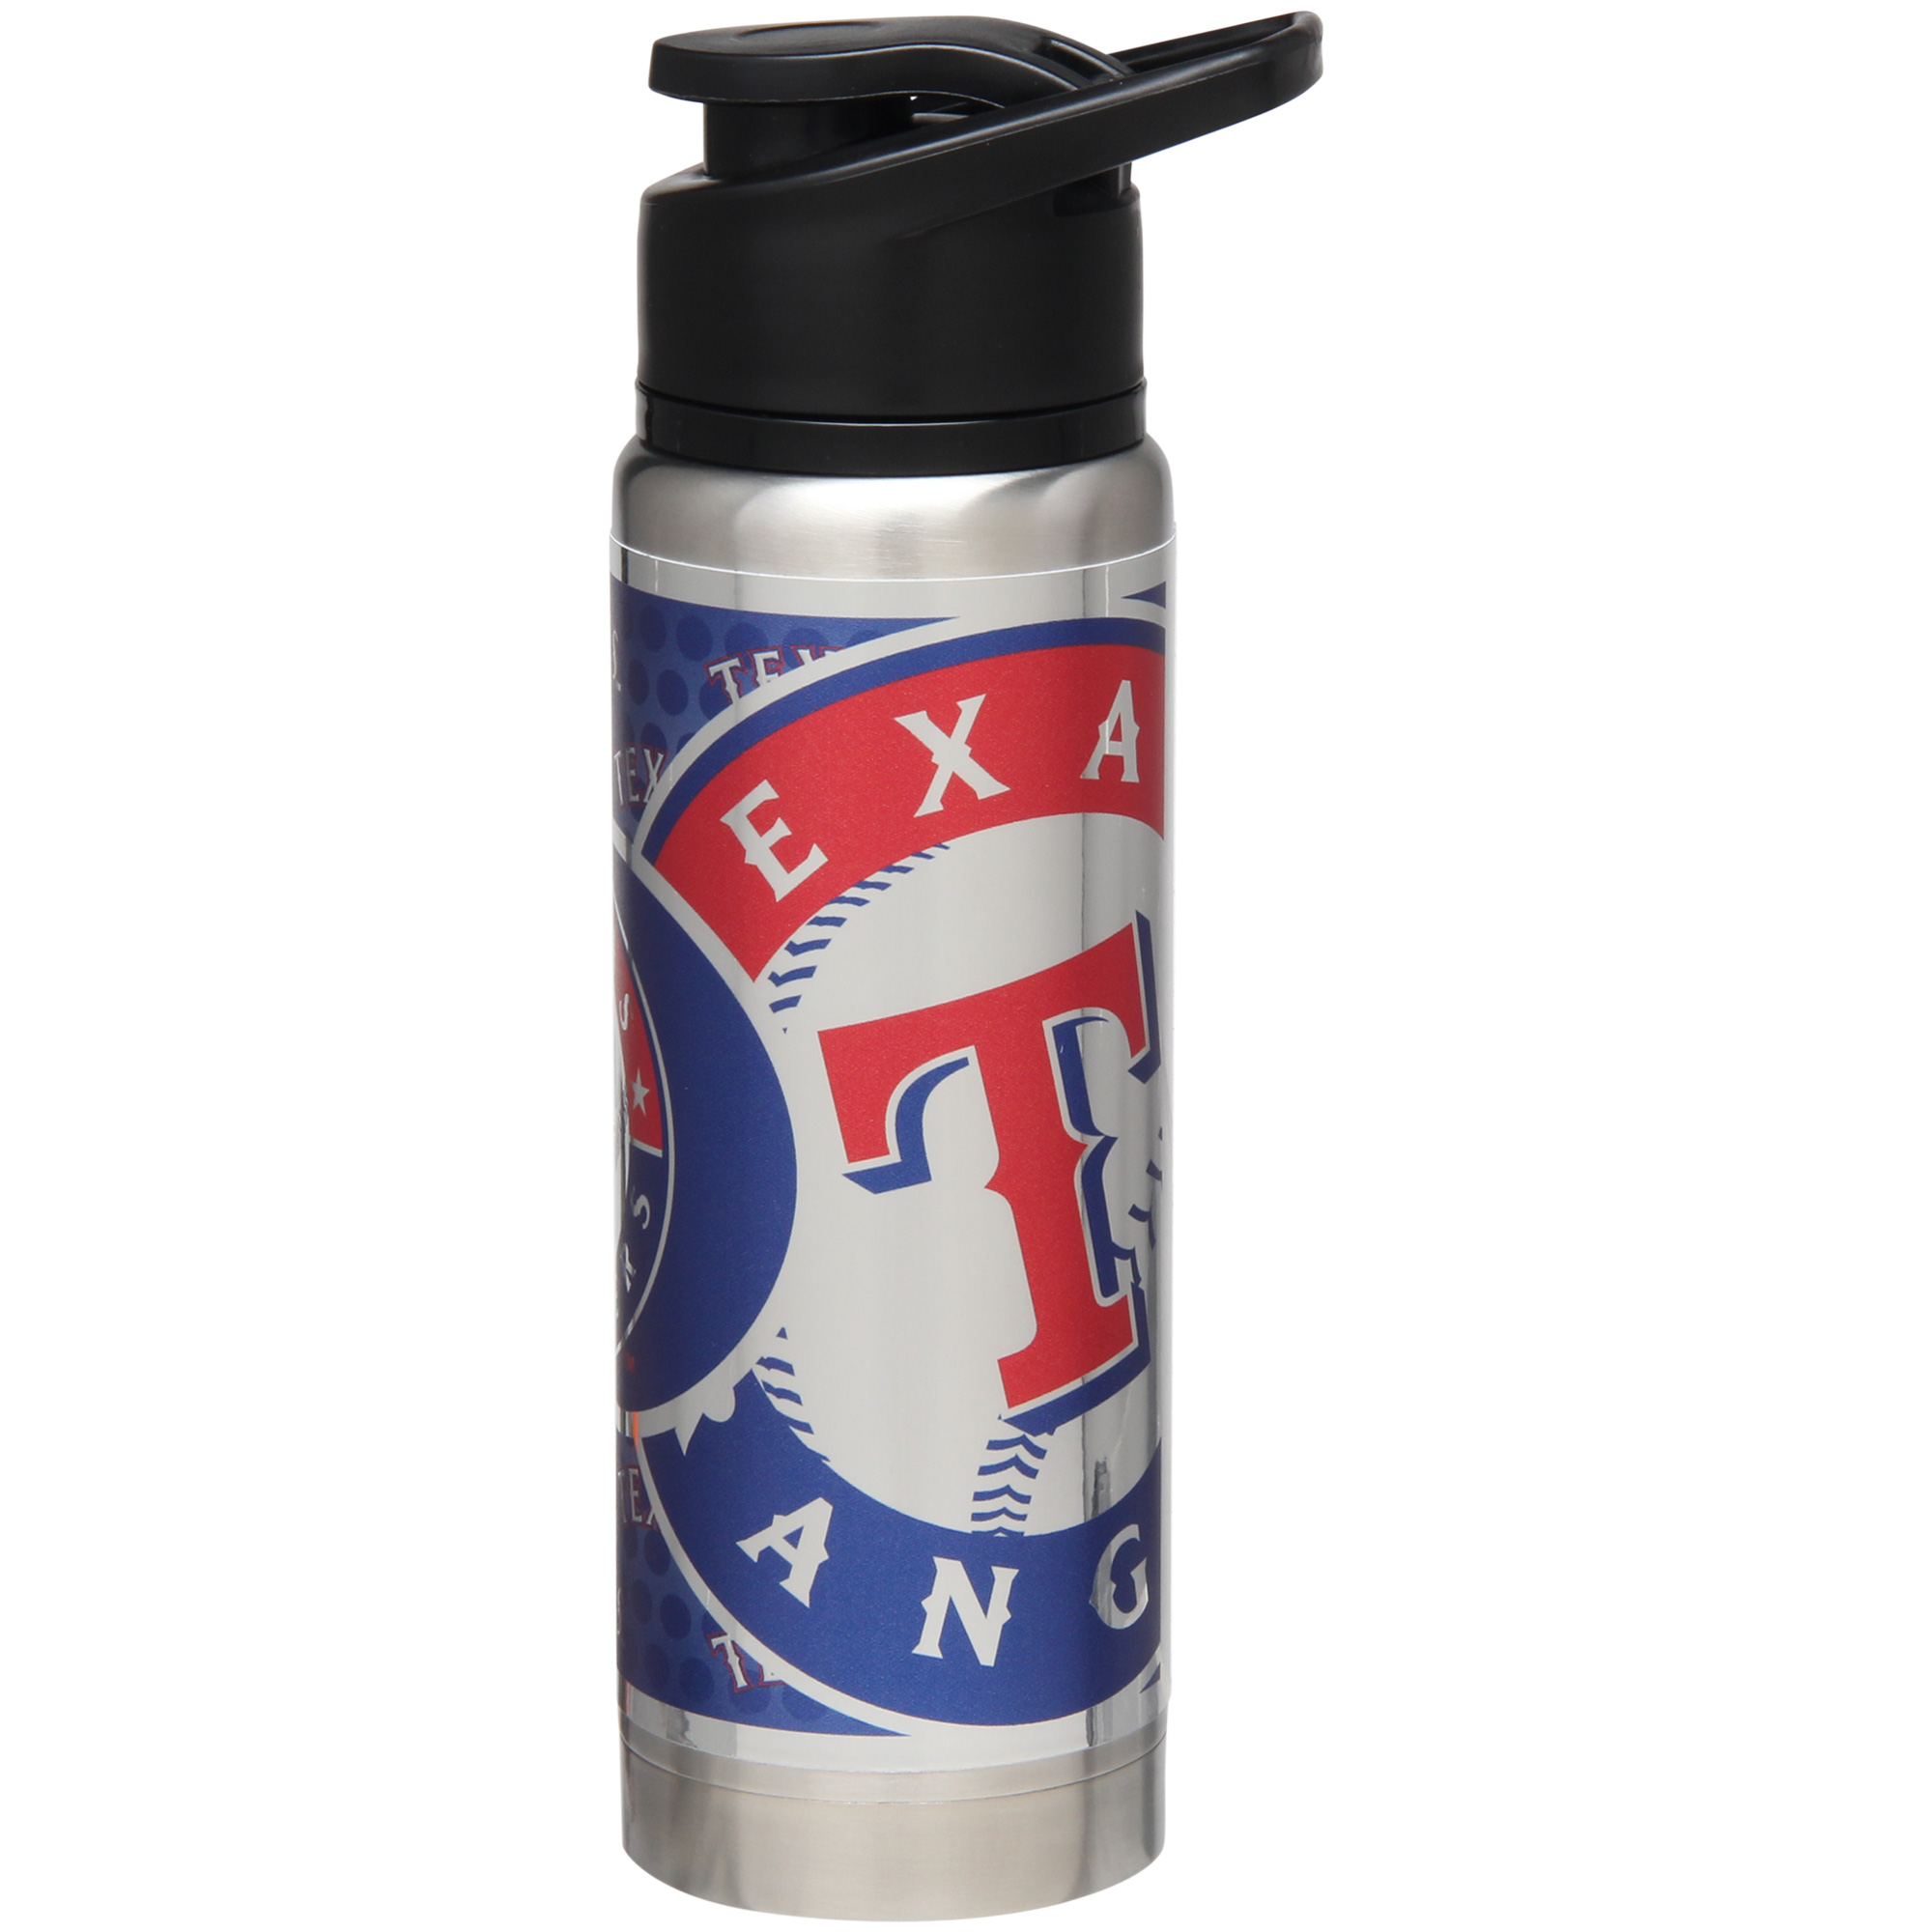 Texas Rangers 20oz. Double Wall Stainless Steel Tumbler - No Size